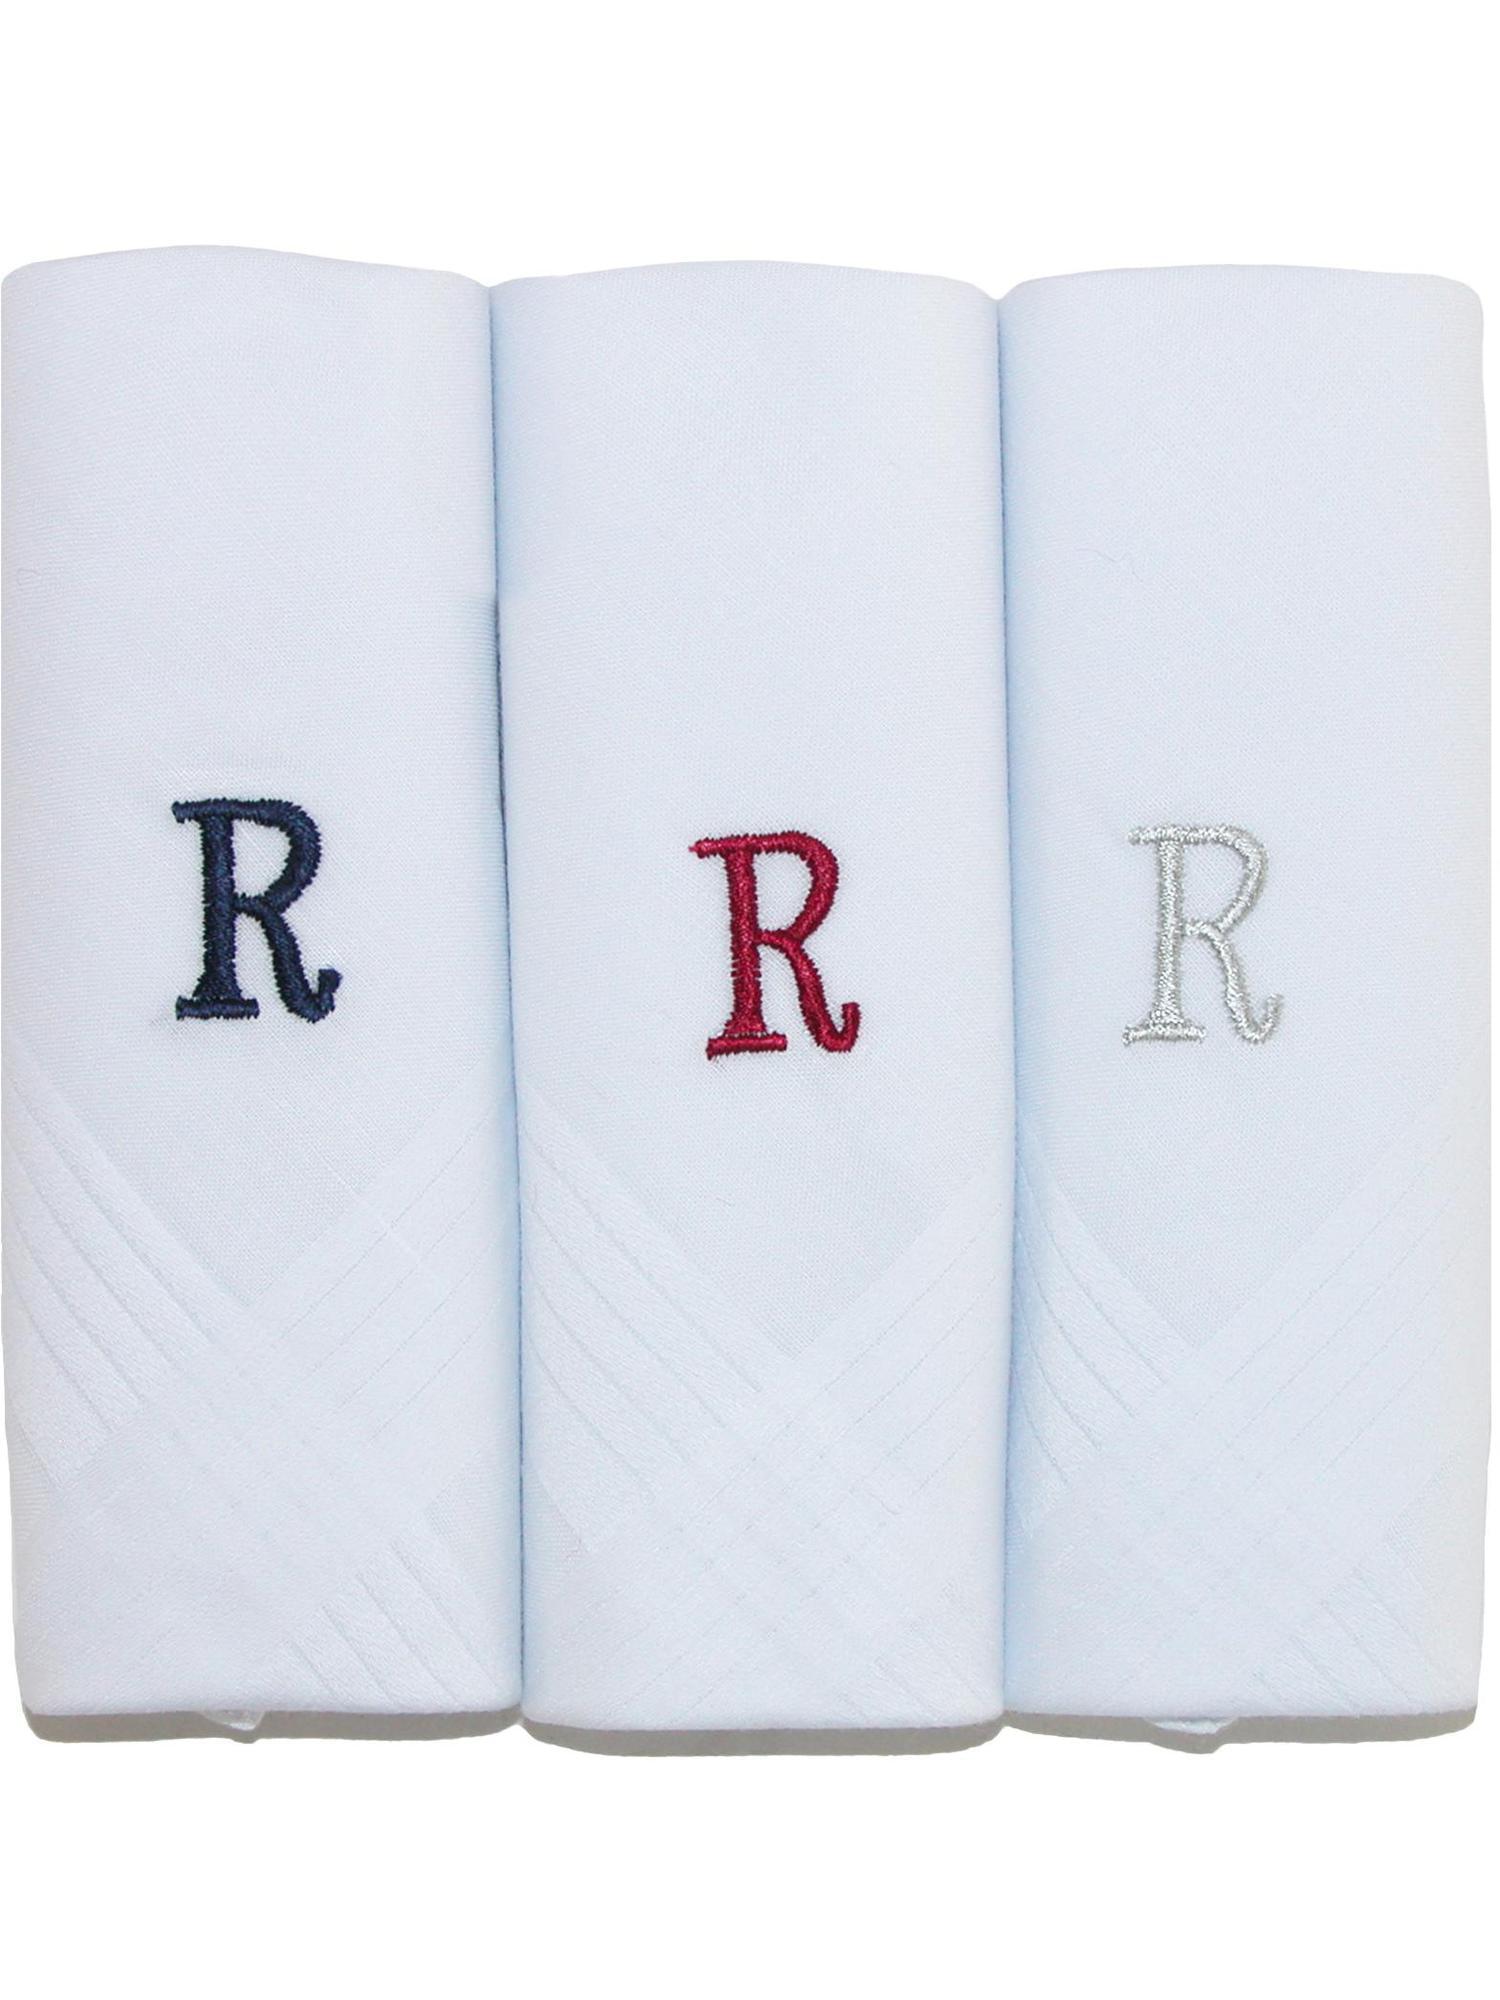 Men's Cotton Boxed Initial Alphabet Handkerchiefs (Pack of 3)